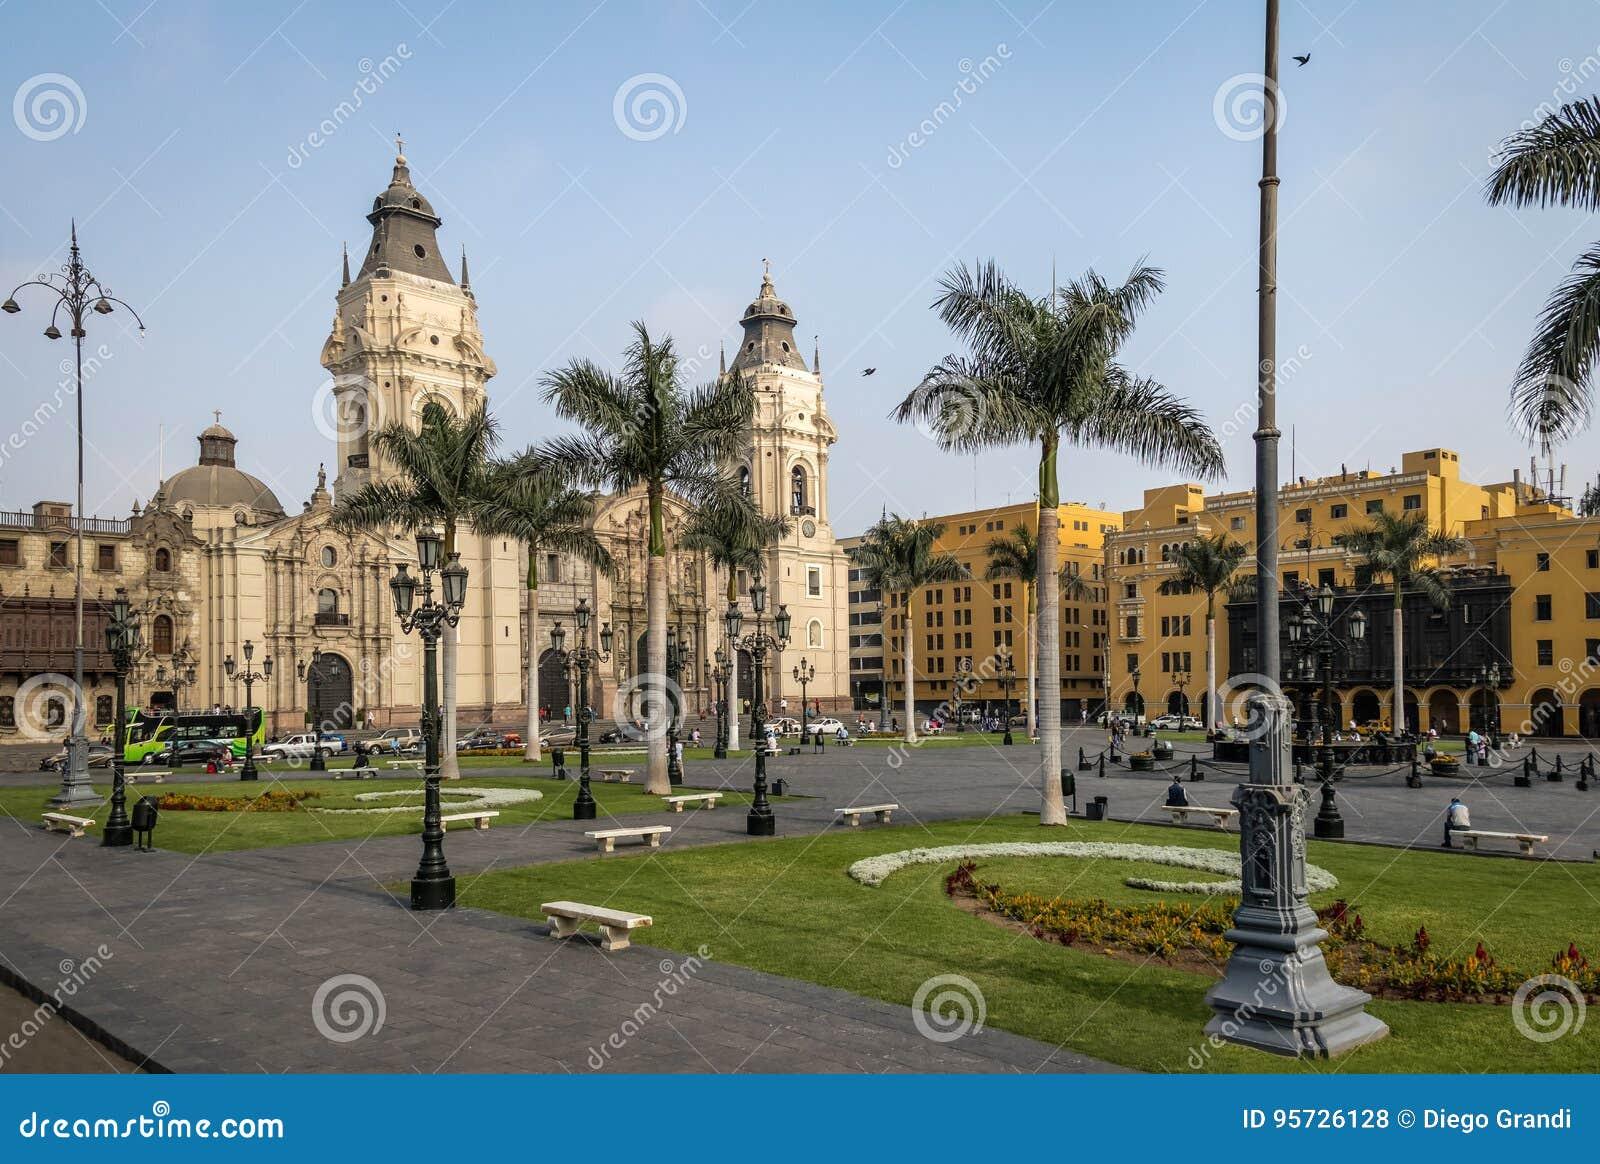 La catedral de la basílica de Lima en alcalde de la plaza - Lima, Perú